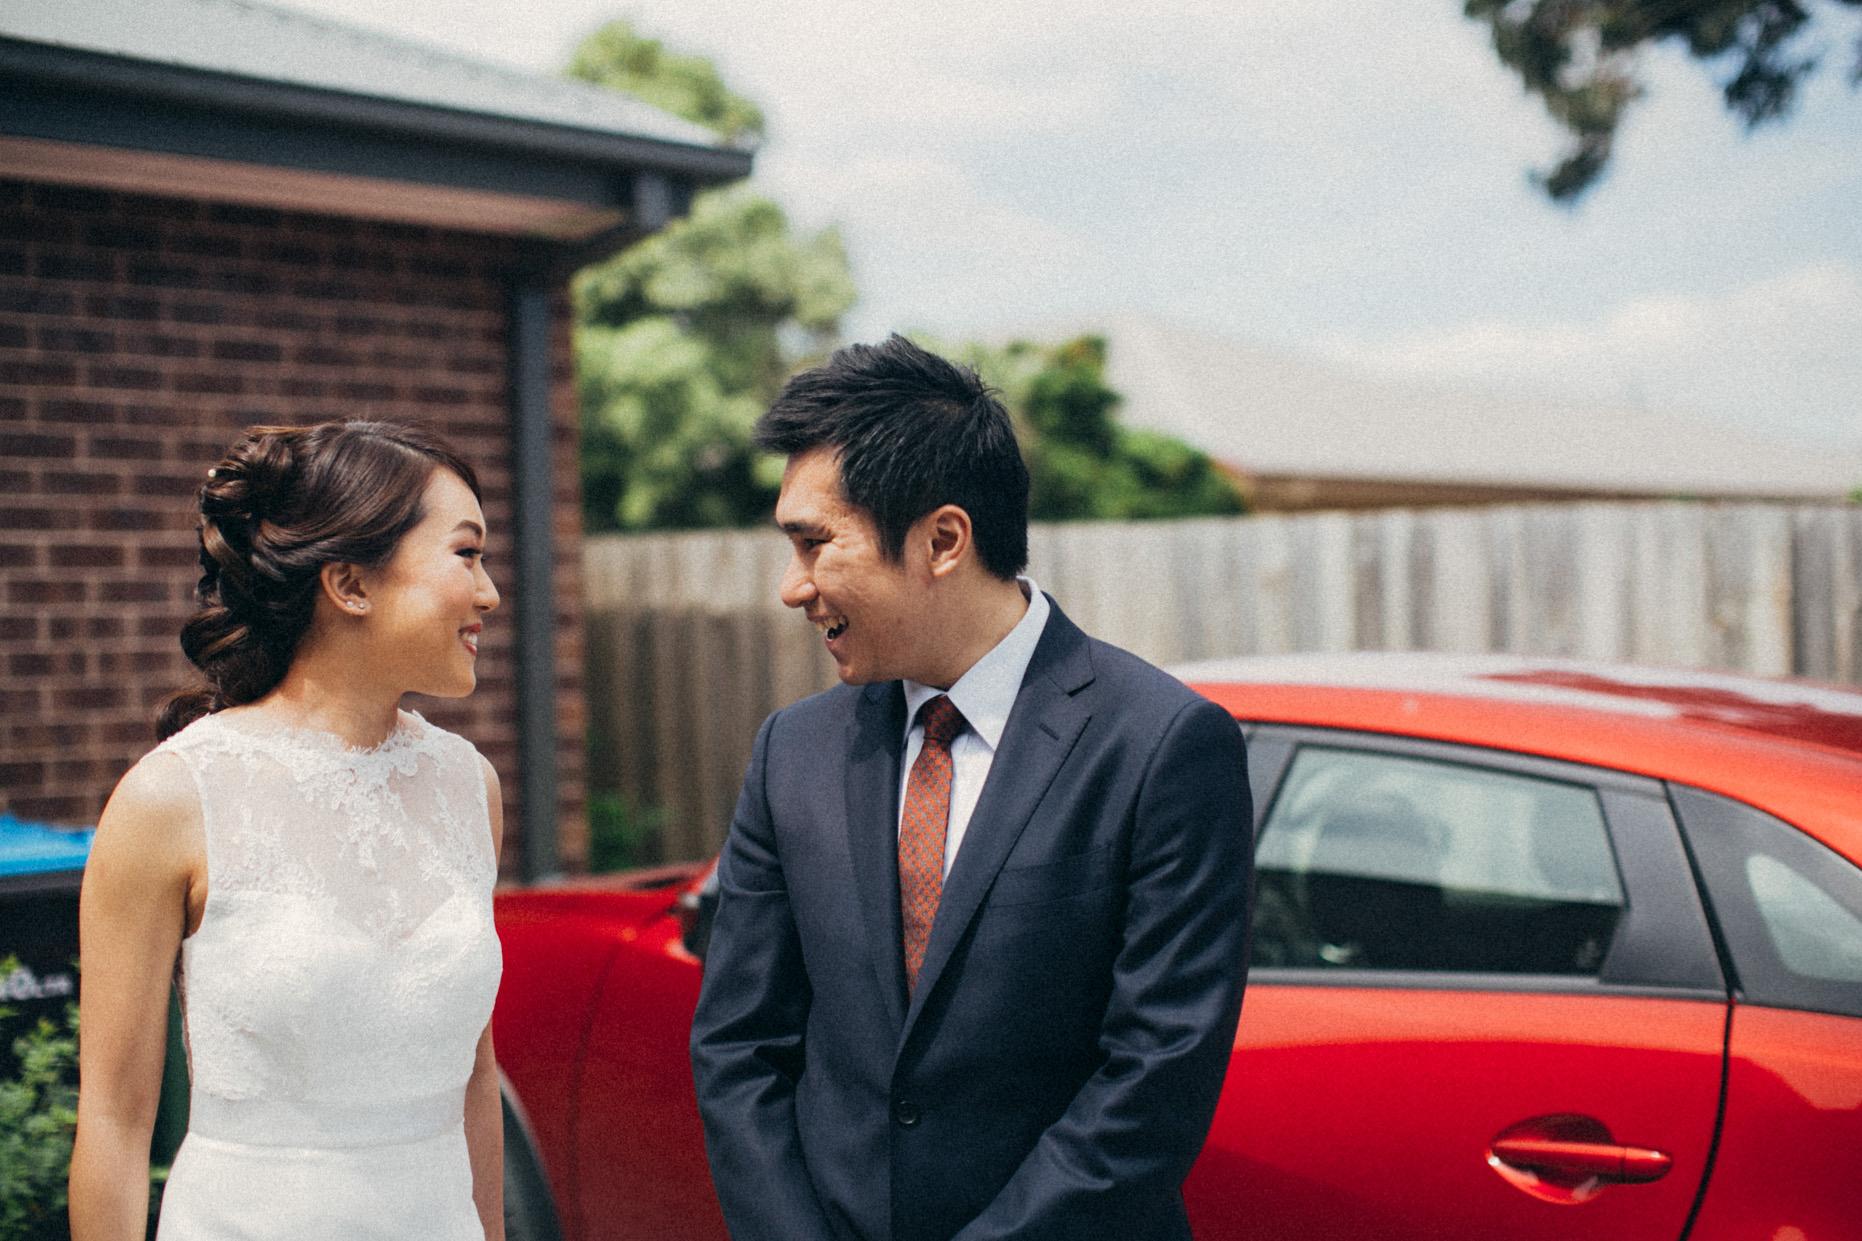 43-australia-melbourne-destination-prewedding-engagement-malaysia-hellojanelee